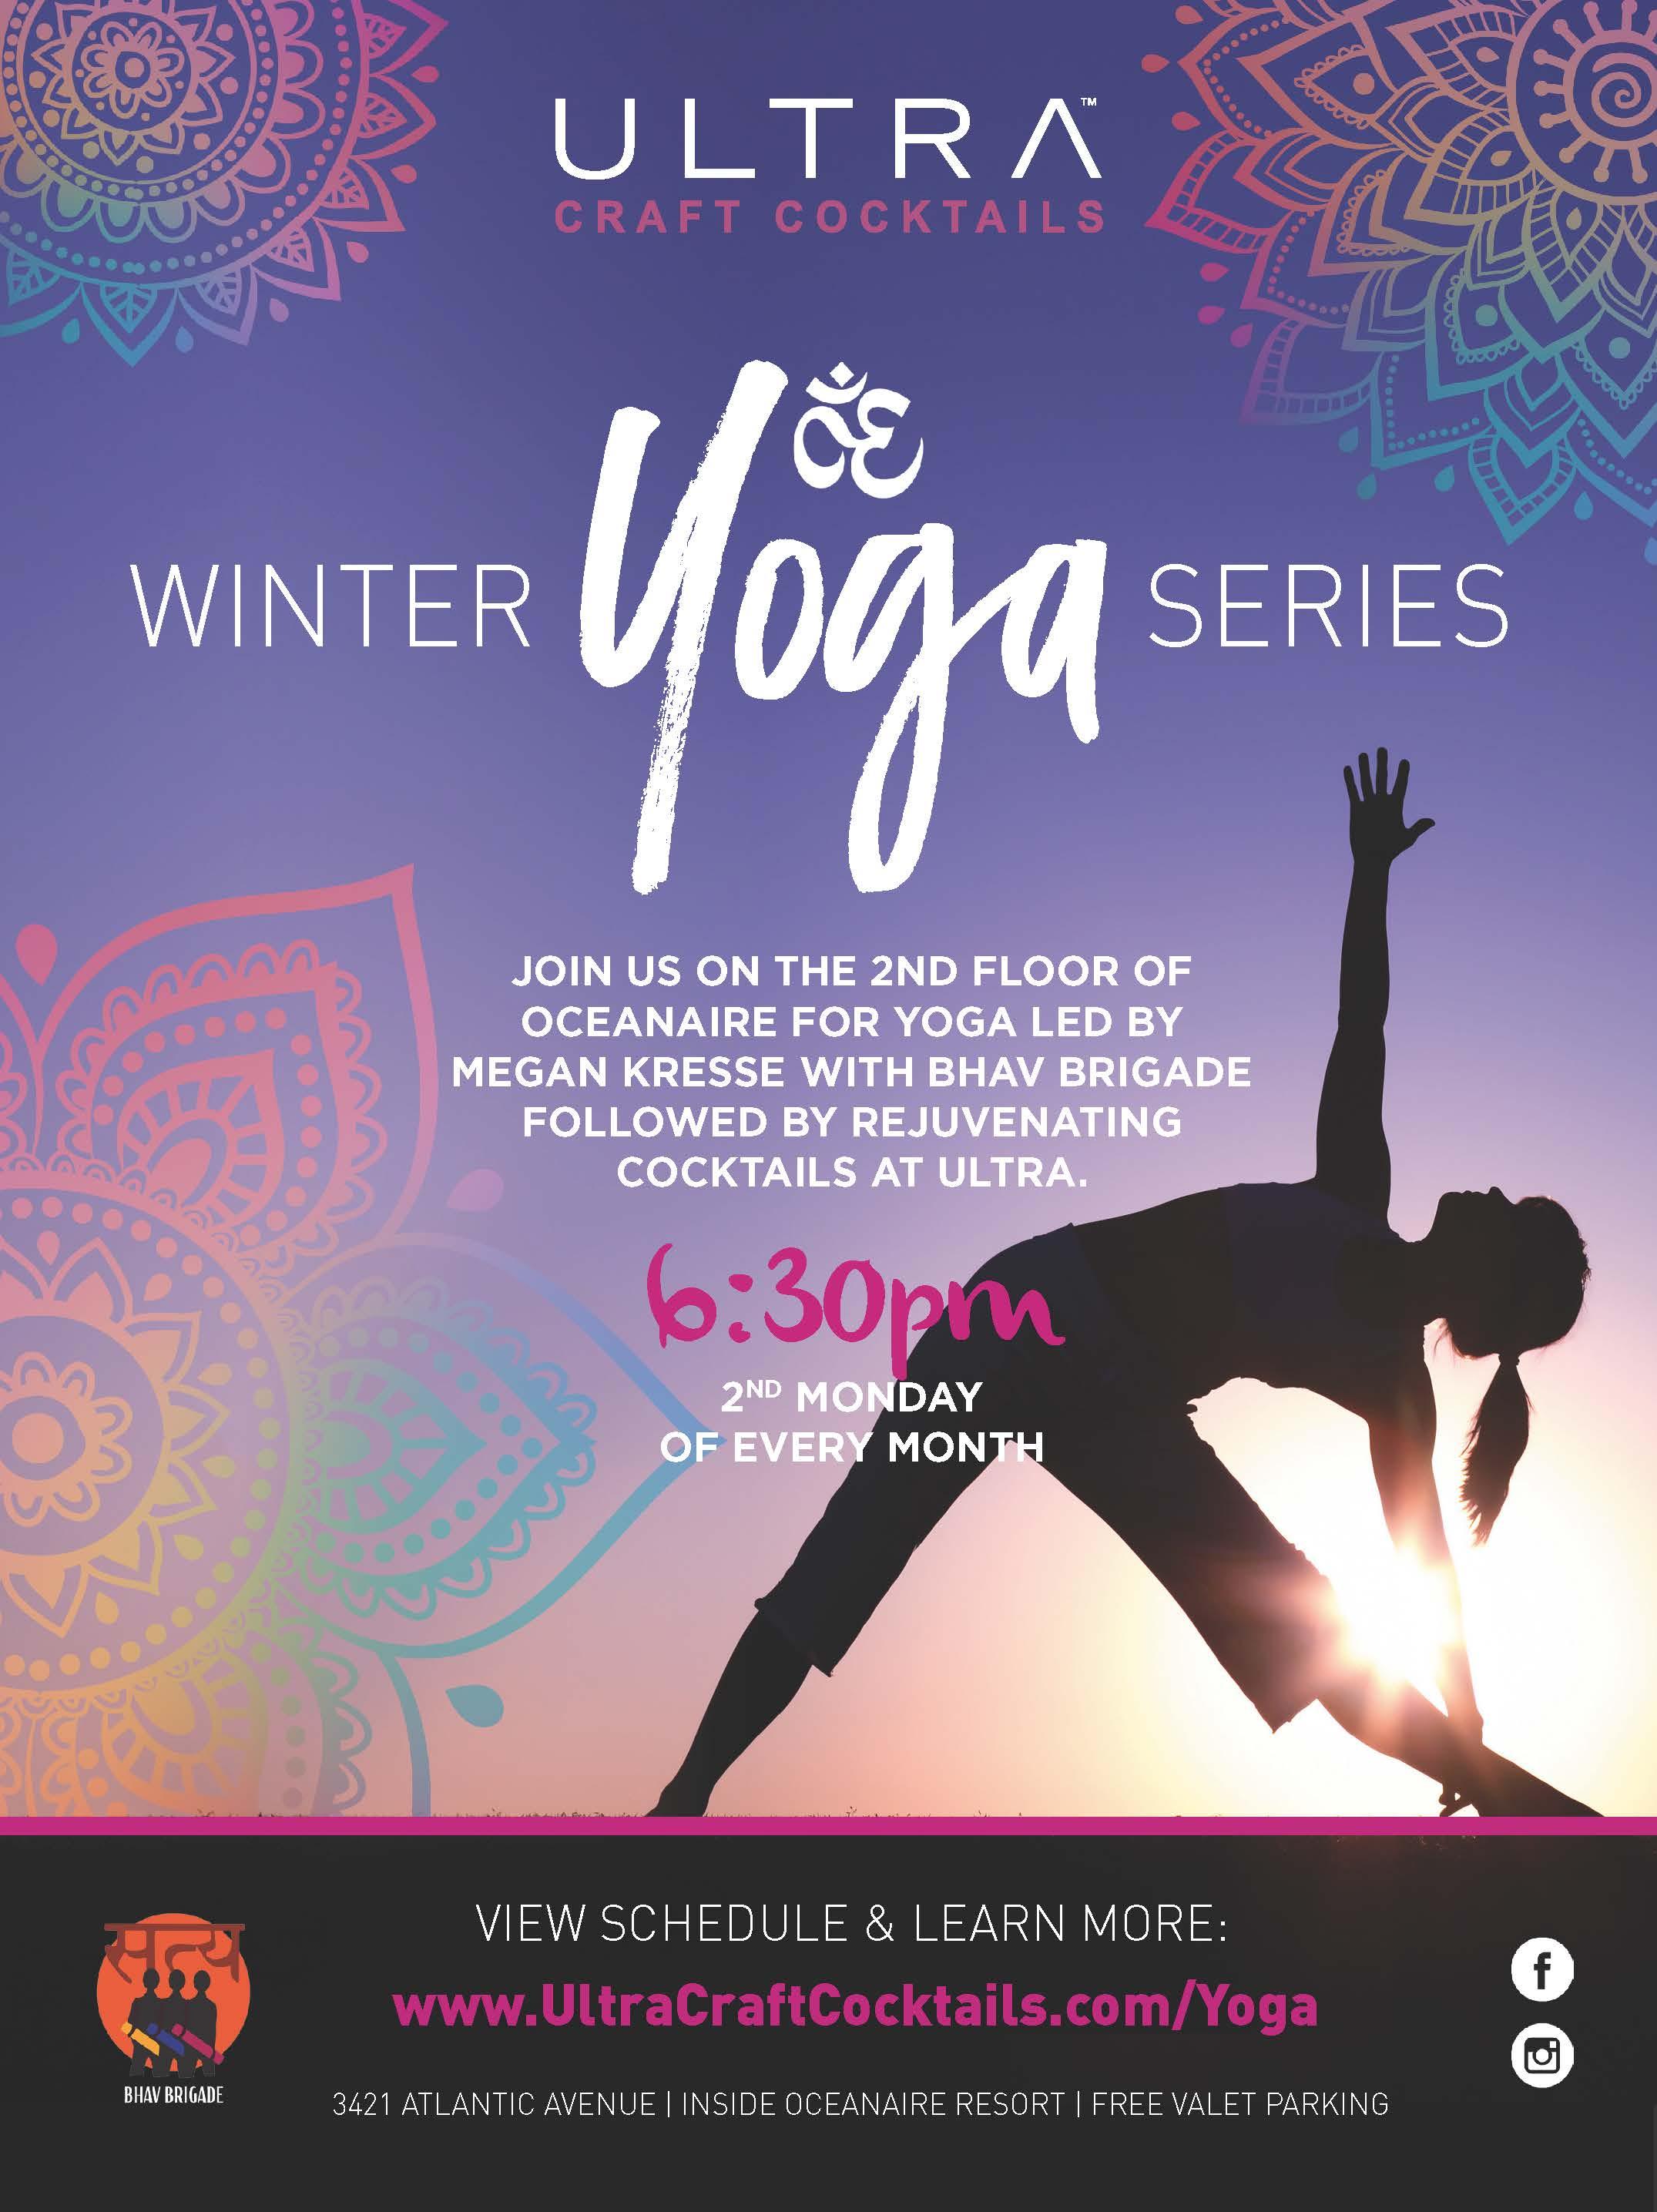 UL_2578 Winter Yoga Series 8.5x11 Generic.jpg